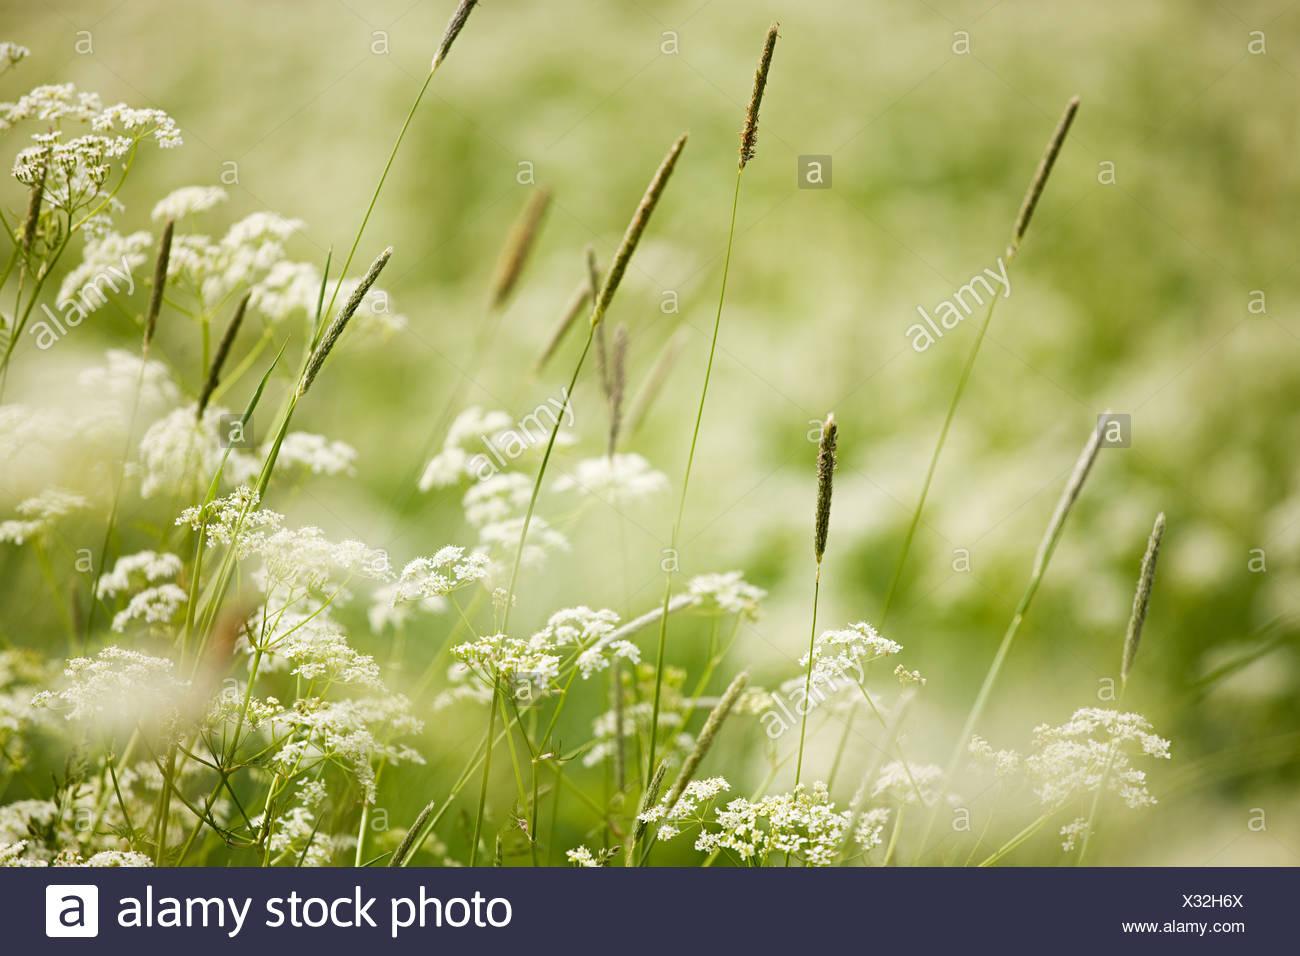 Close up of wild plants - Stock Image